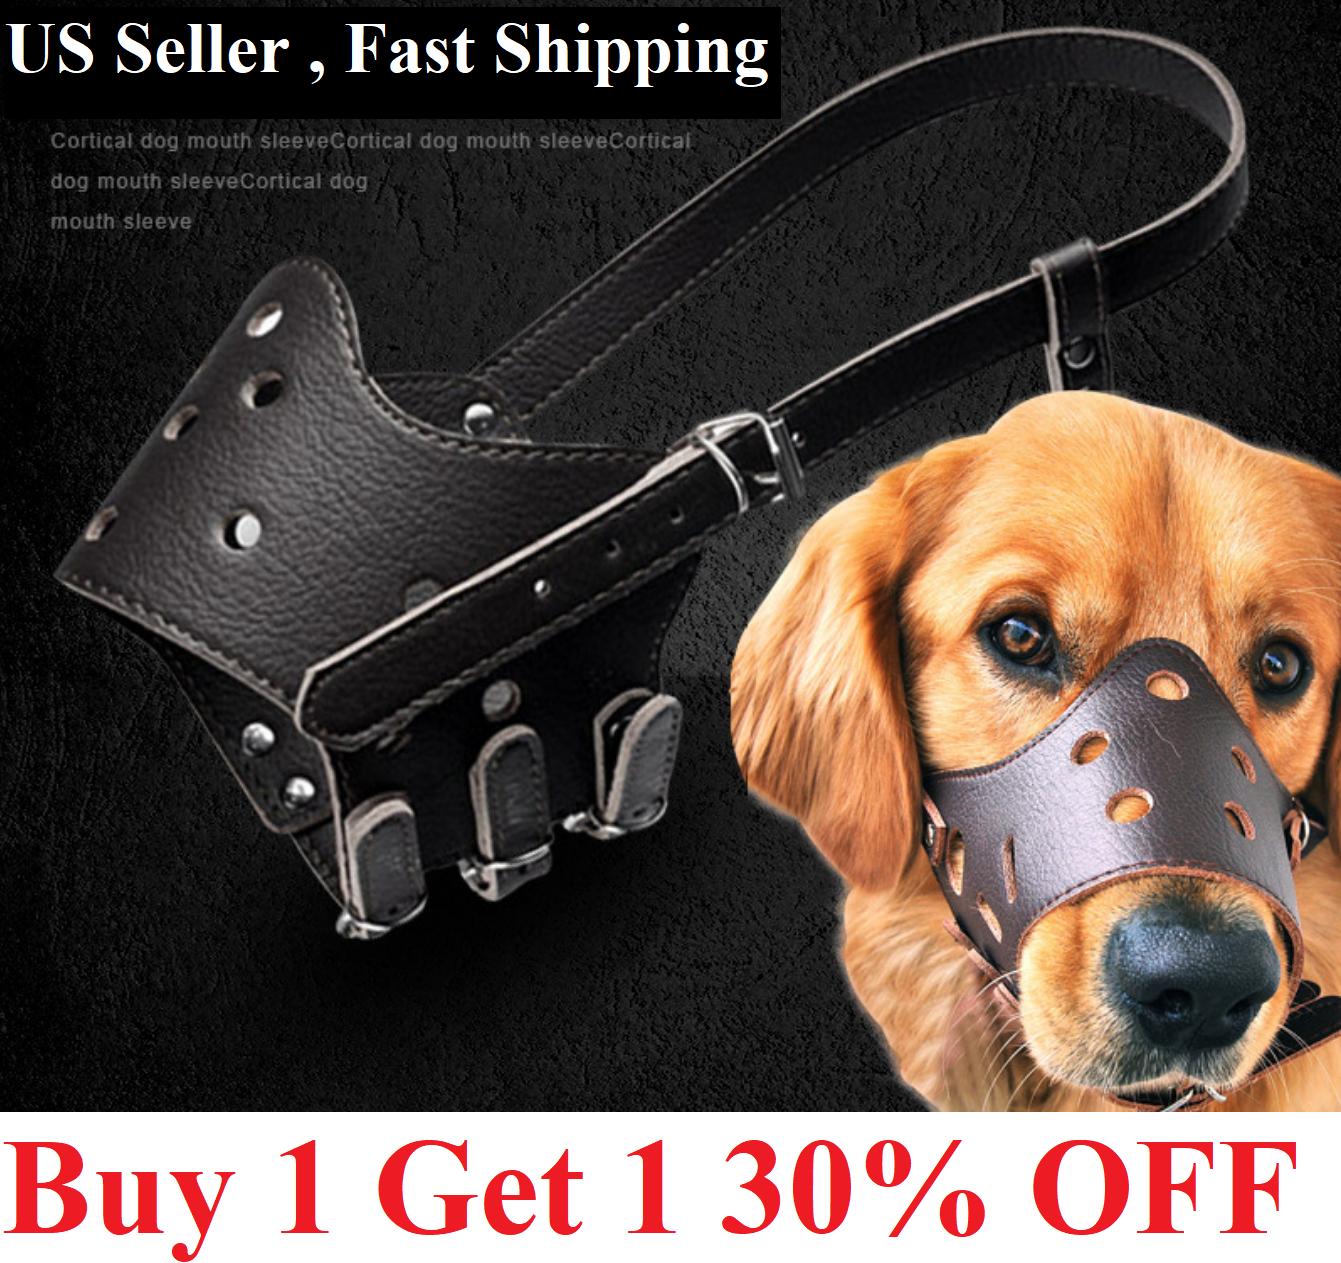 US Adjustable Anti-Biting Pet Dog Soft PU Leather Muzzles Mouth Mesh Cover Masks Dog Supplies